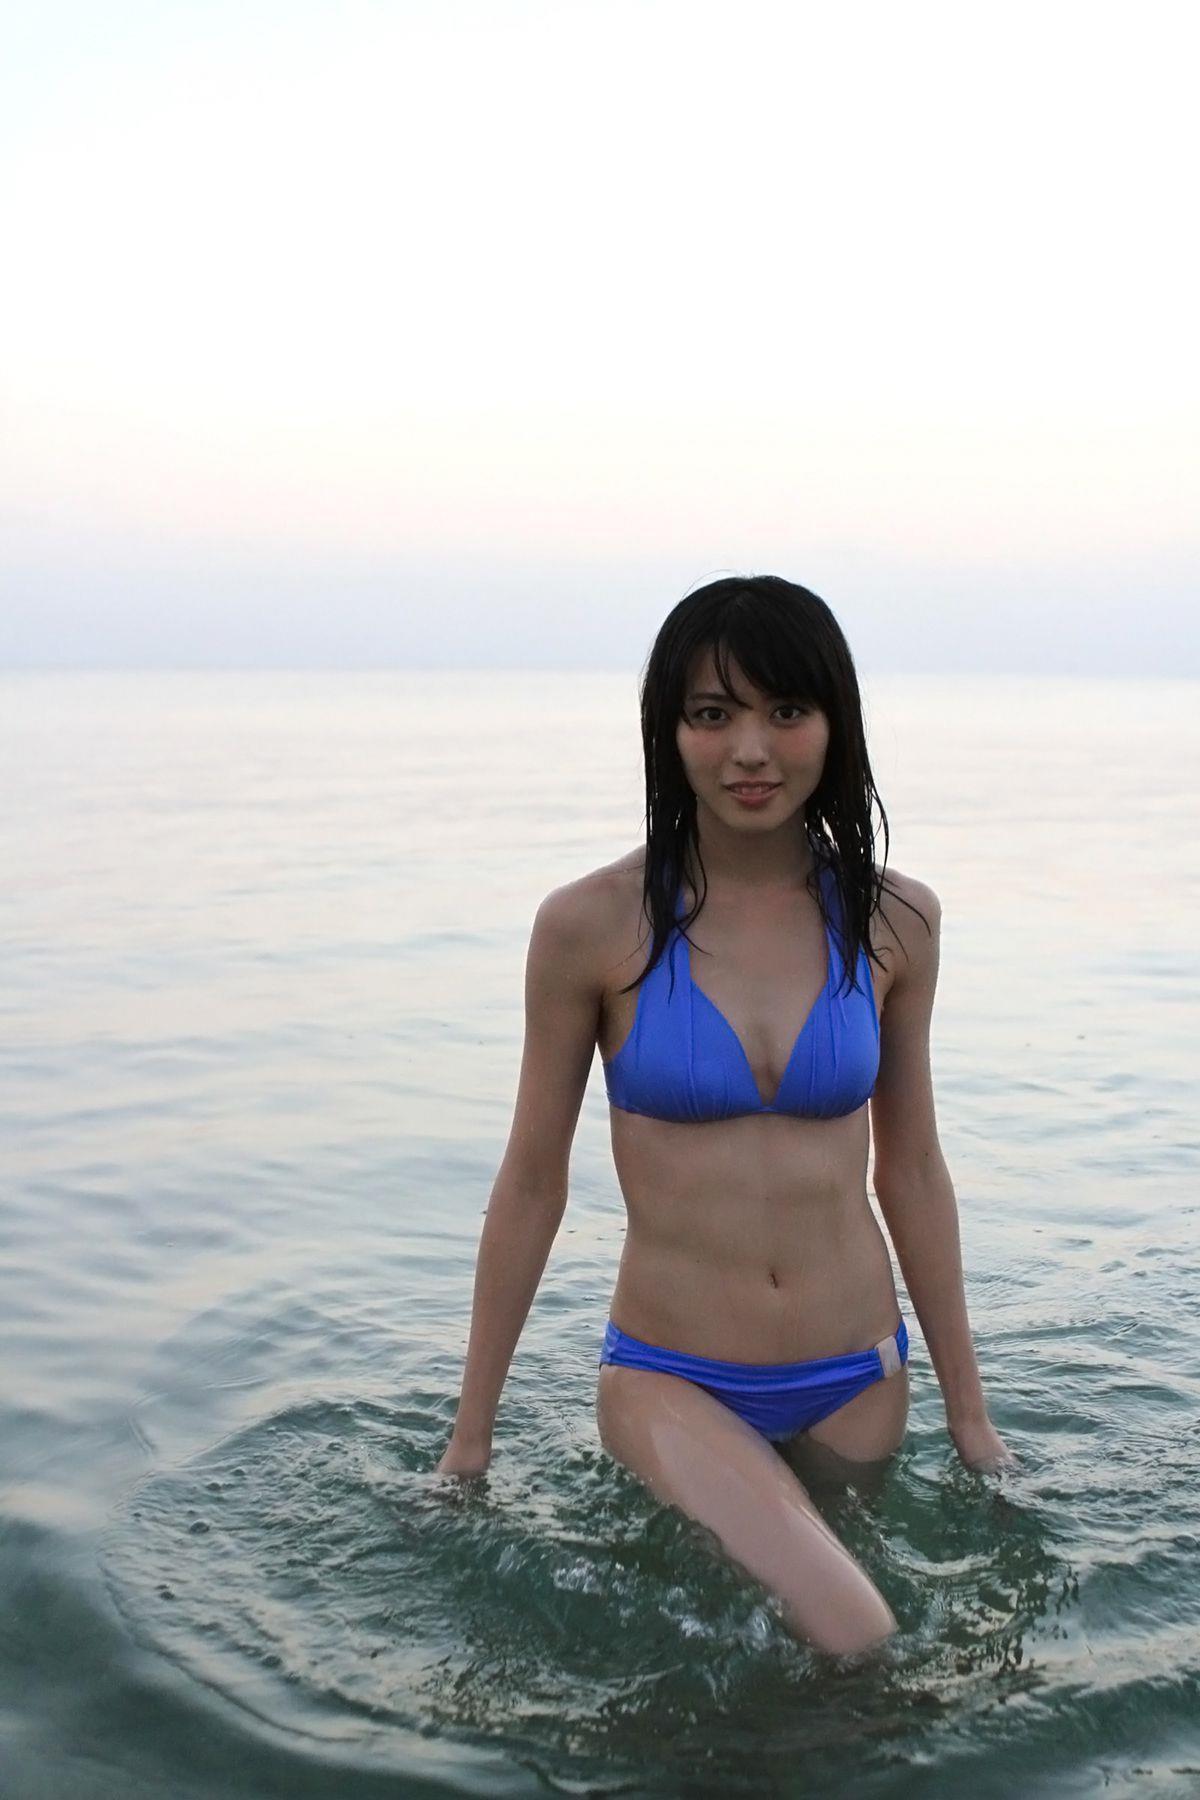 矢島舞美 エロ画像 96